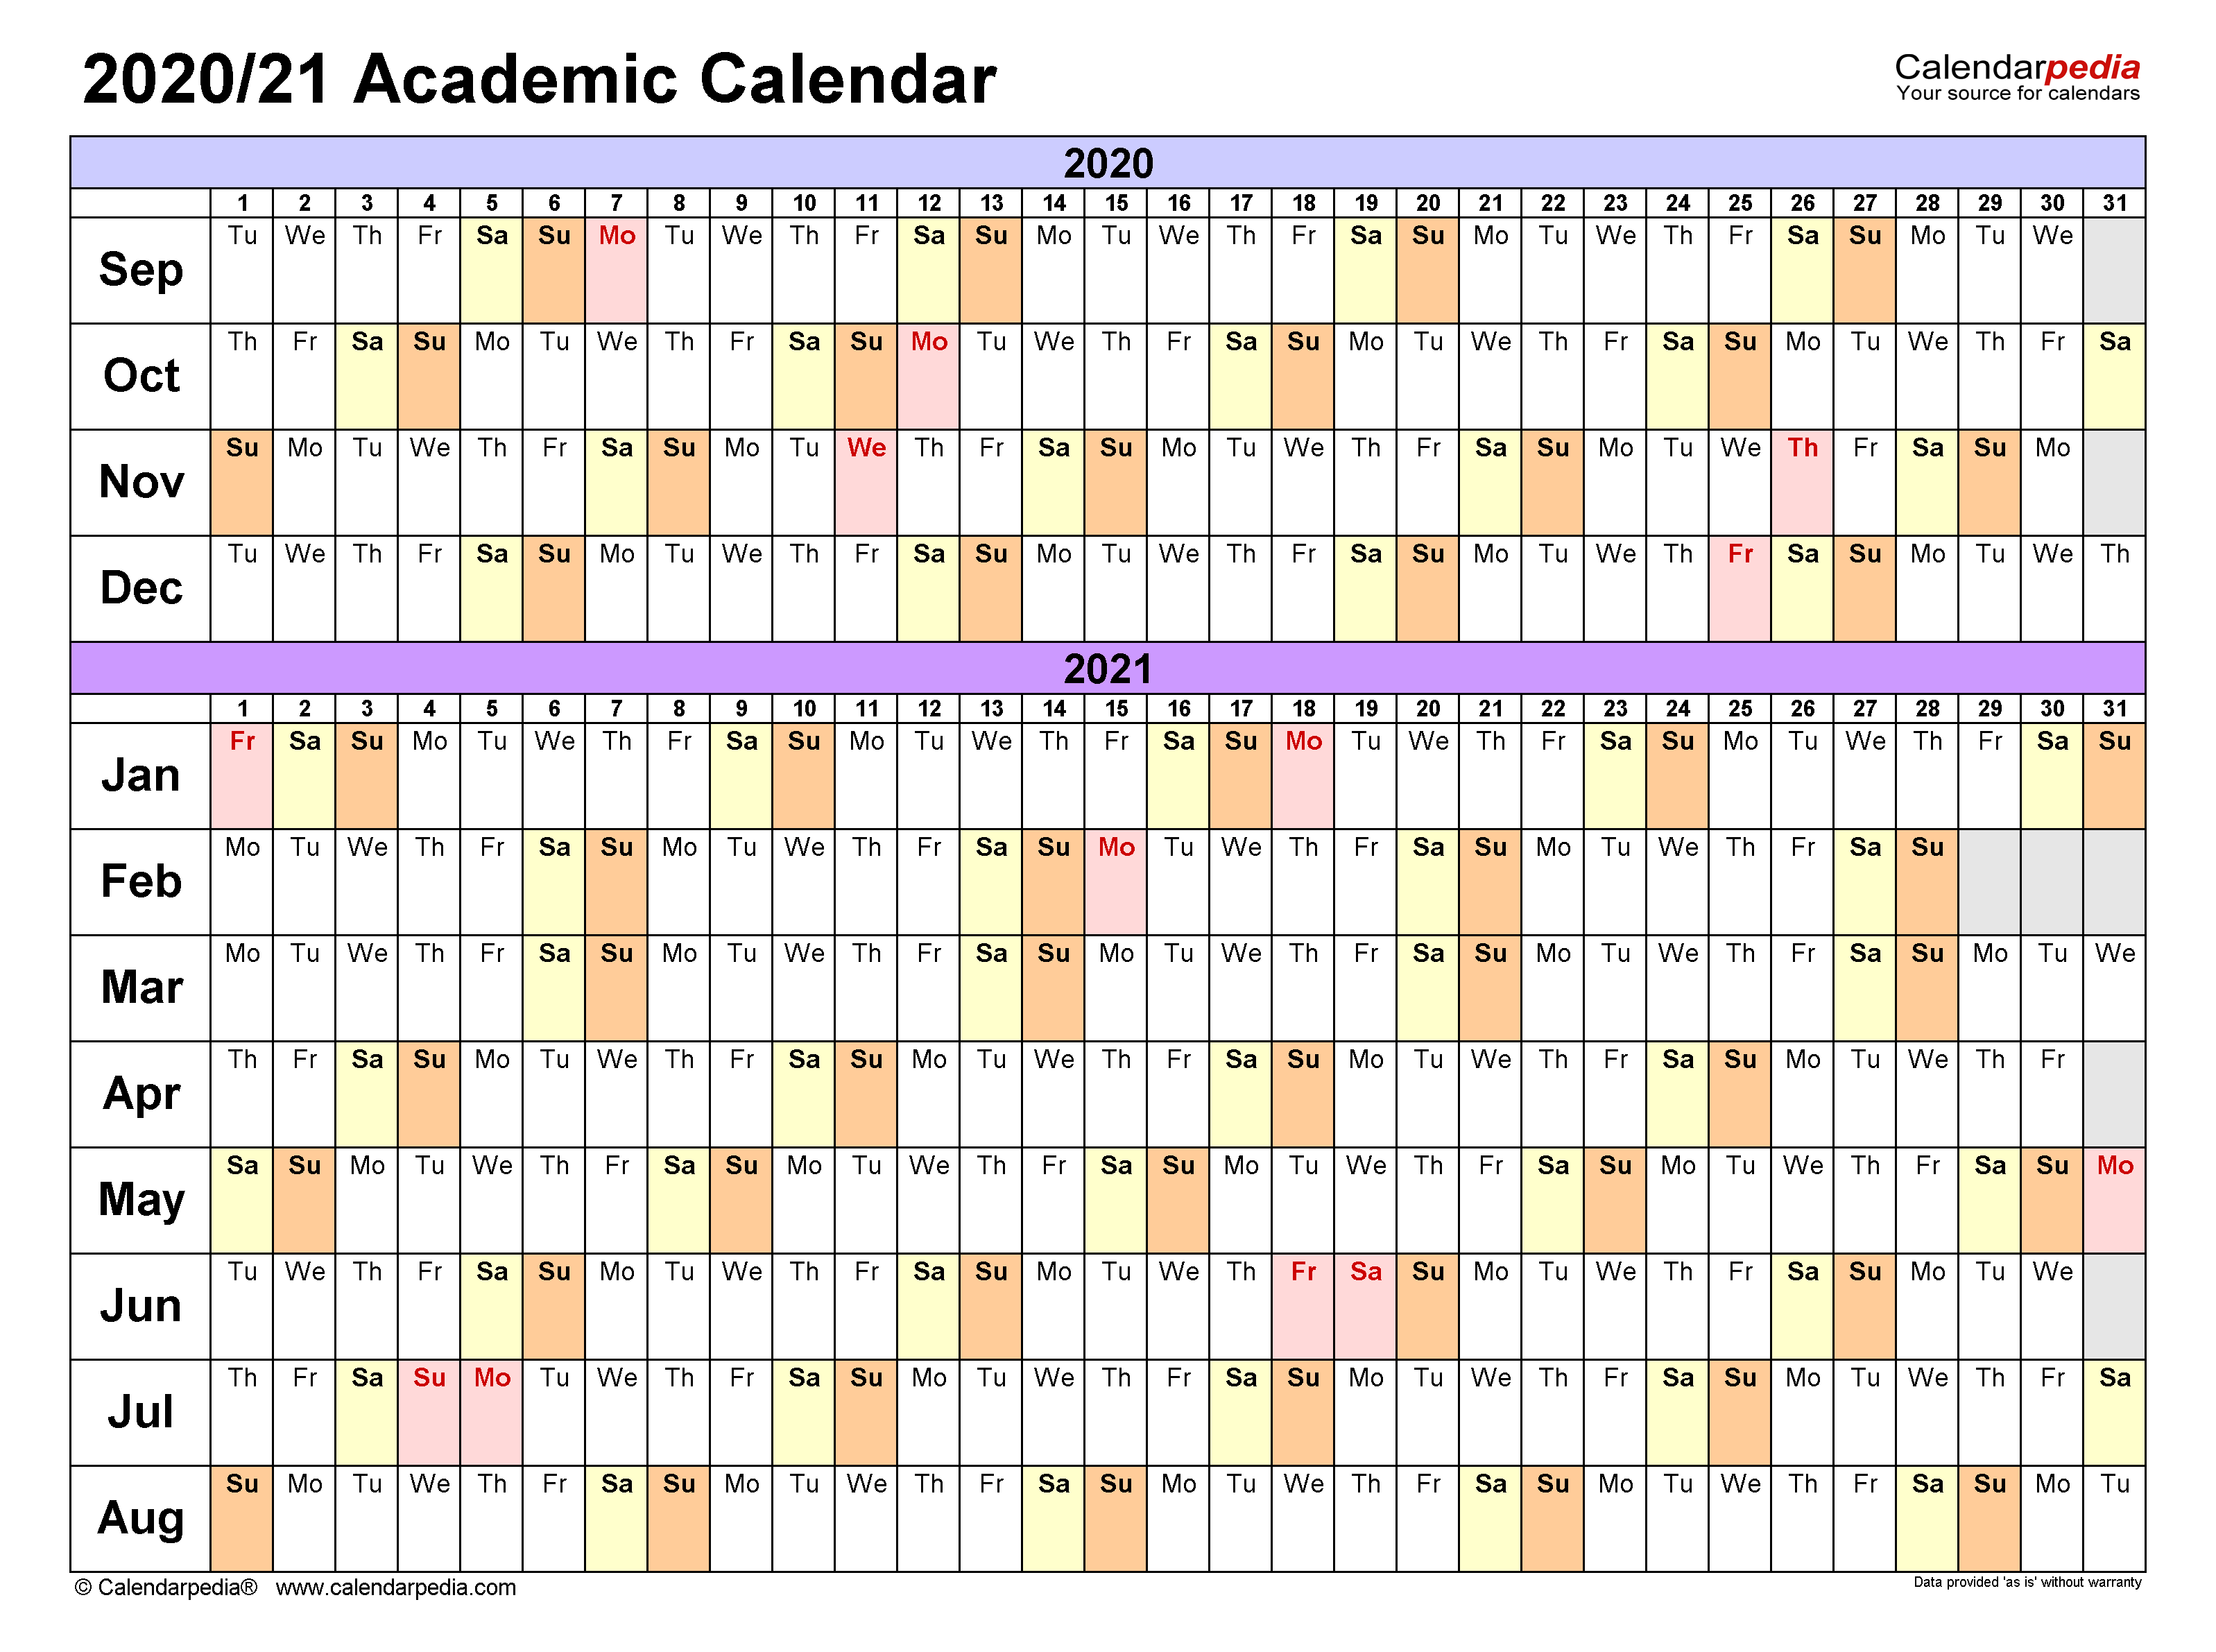 Ohio University Academic Calendar 2022 23.Academic Calendars 2020 2021 Free Printable Excel Templates